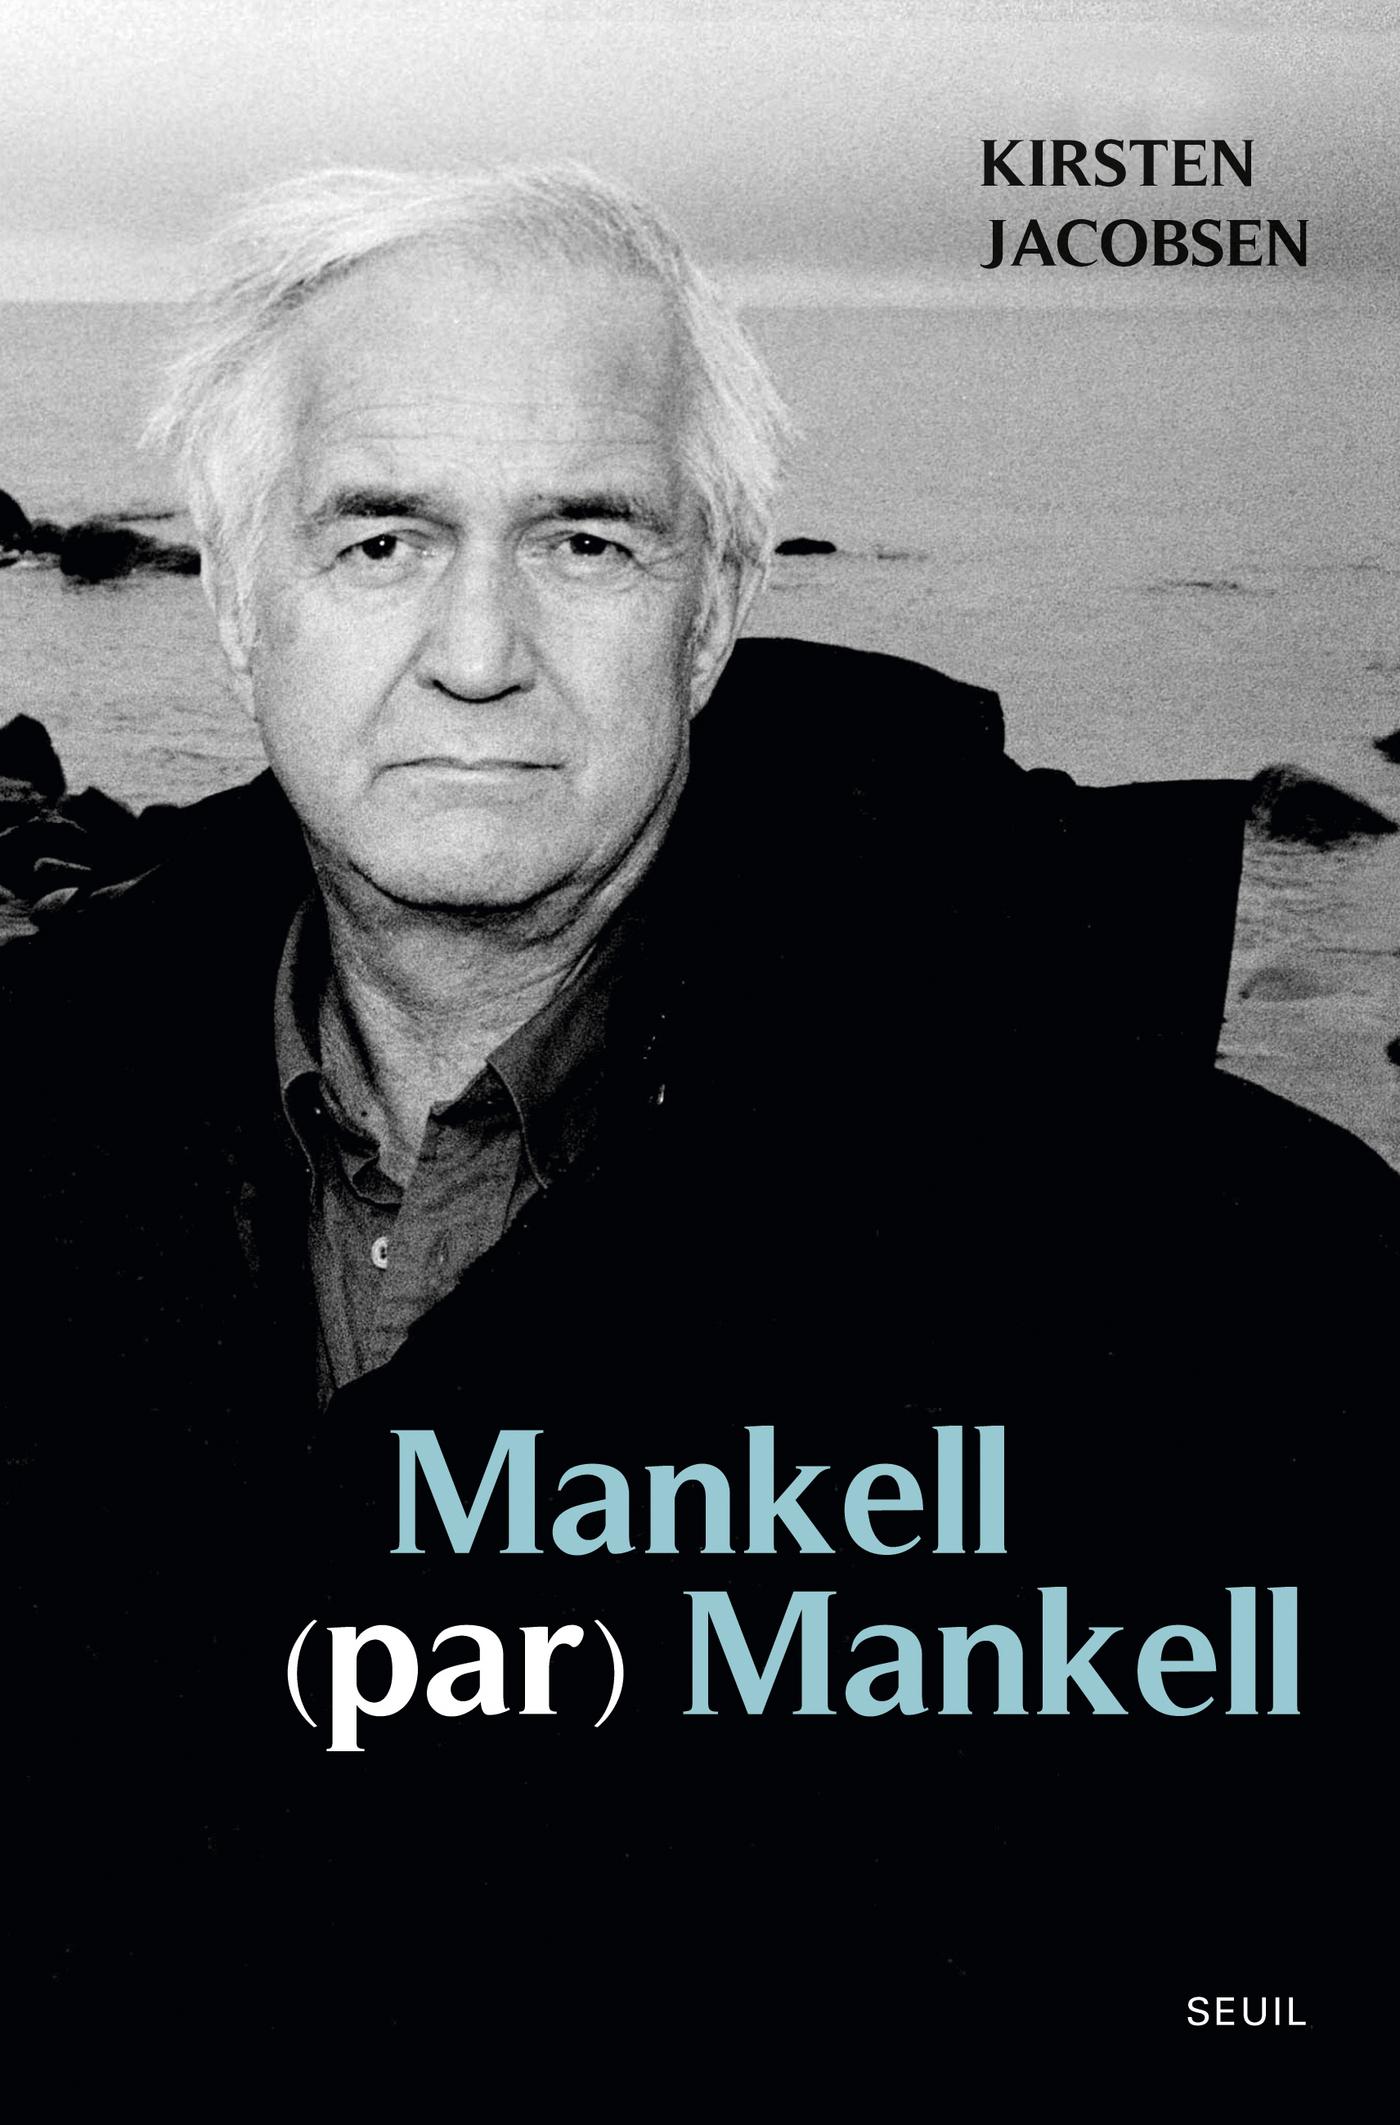 Couverture : Mankell par Mankell Kirsten Jacobsen